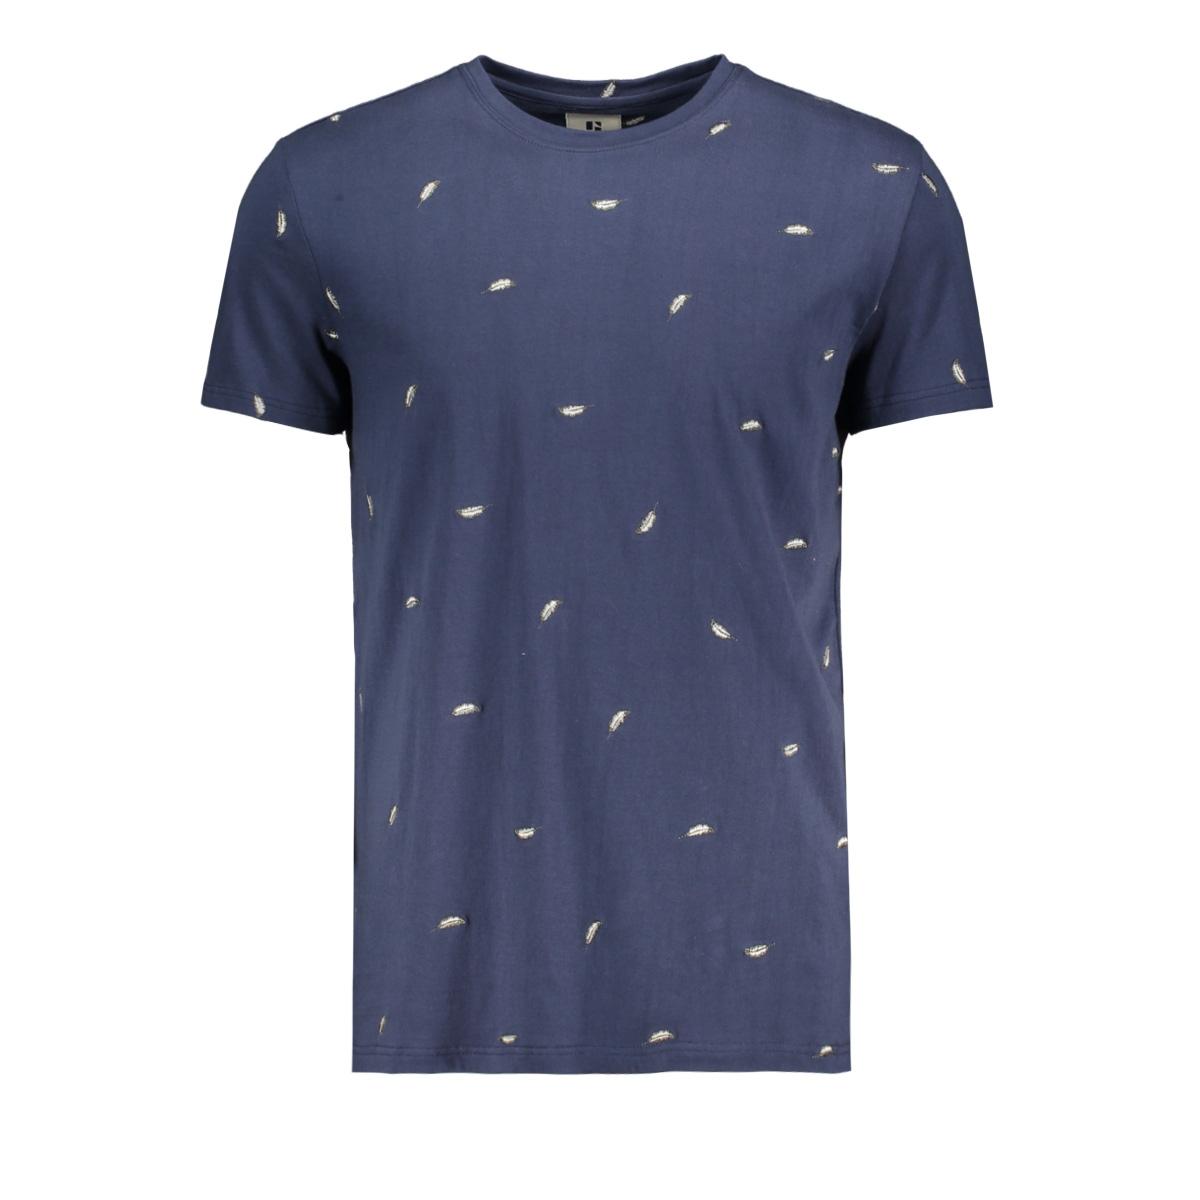 b91210 garcia t-shirt 70 marine